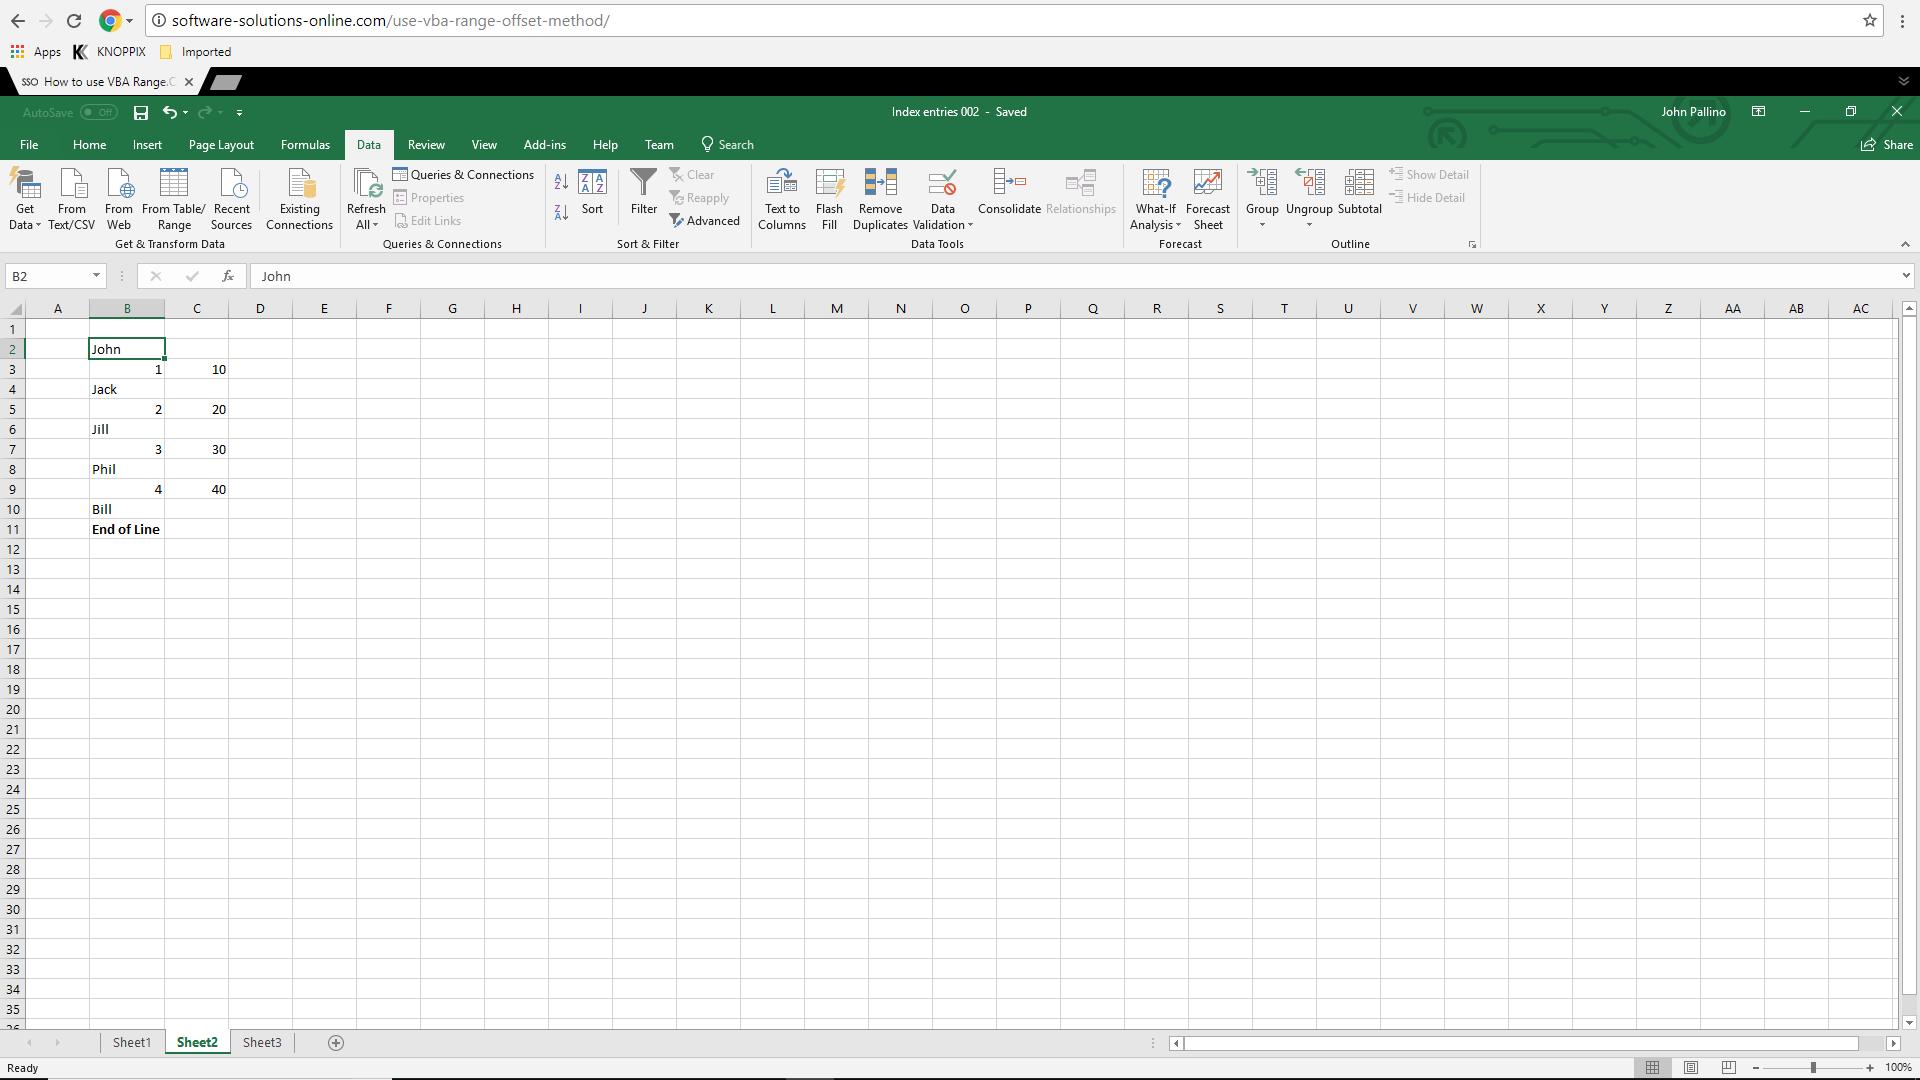 Excel VBA Screenshot